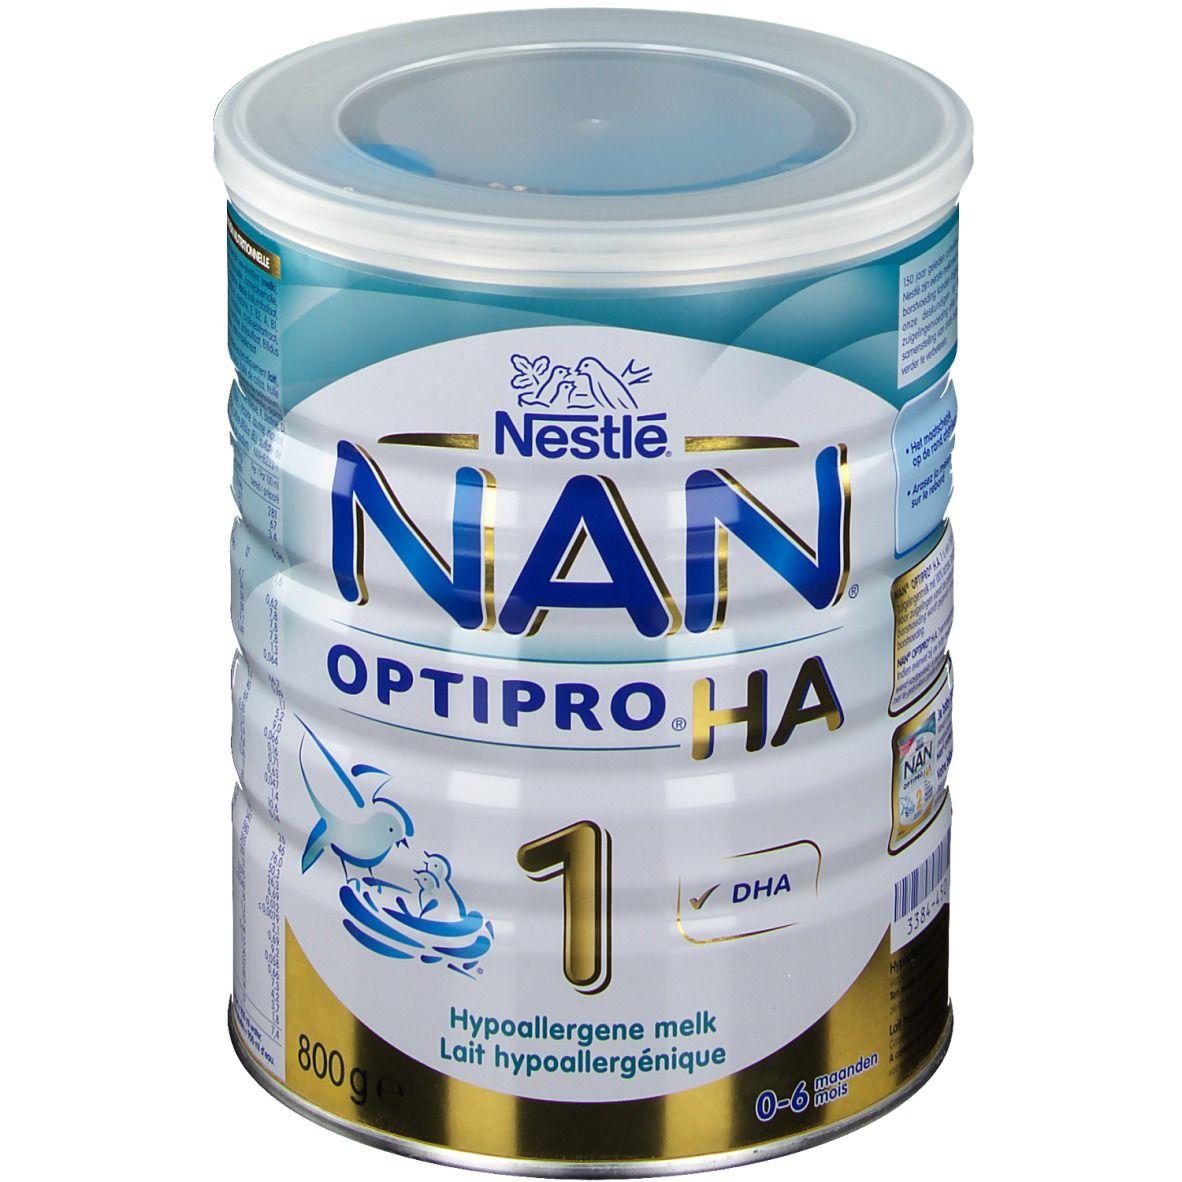 Nestlé NAN OPTIPRO HA 1